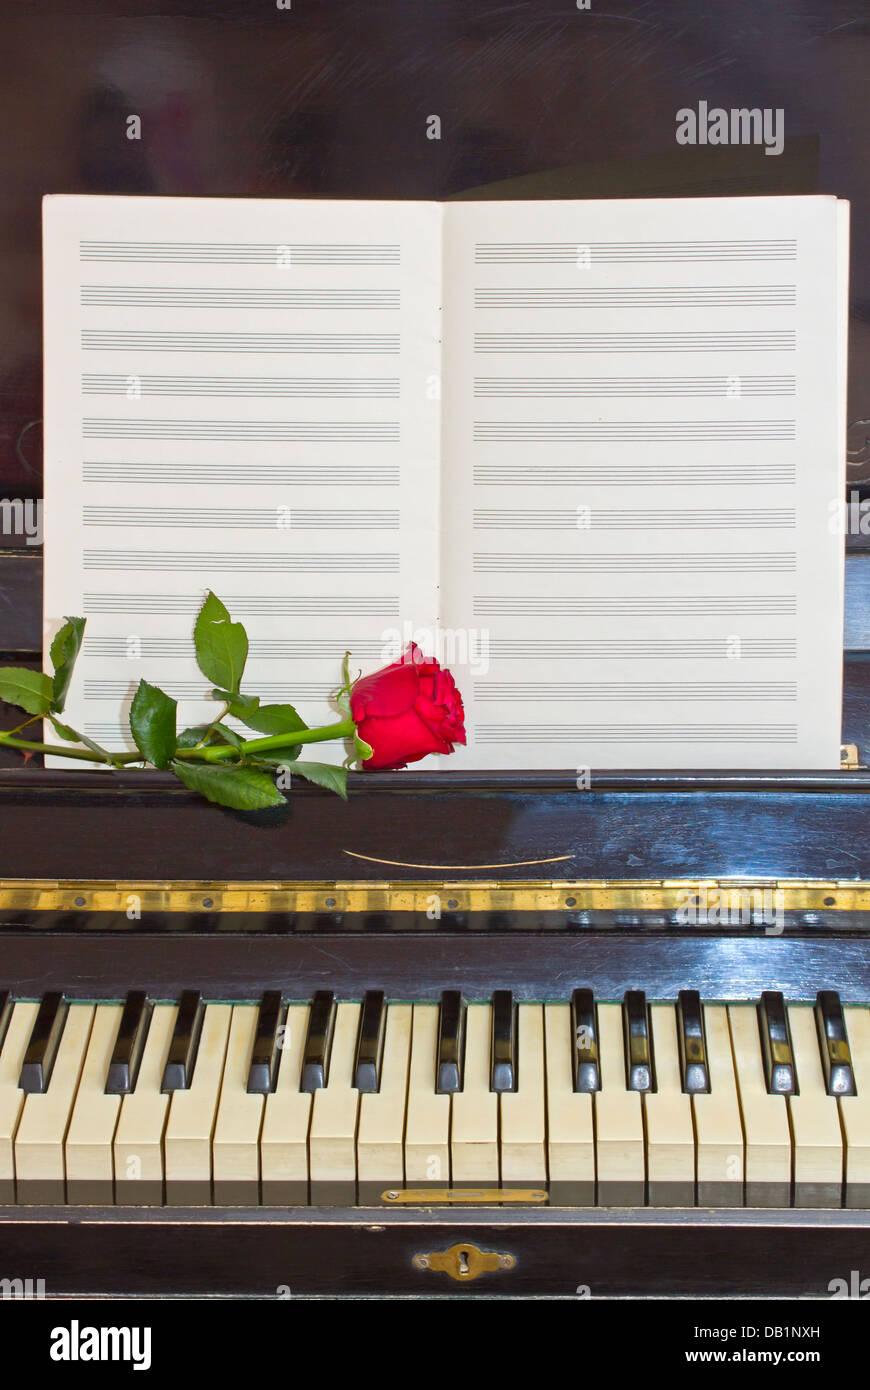 Rose Piano Stockfotos & Rose Piano Bilder - Seite 3 - Alamy